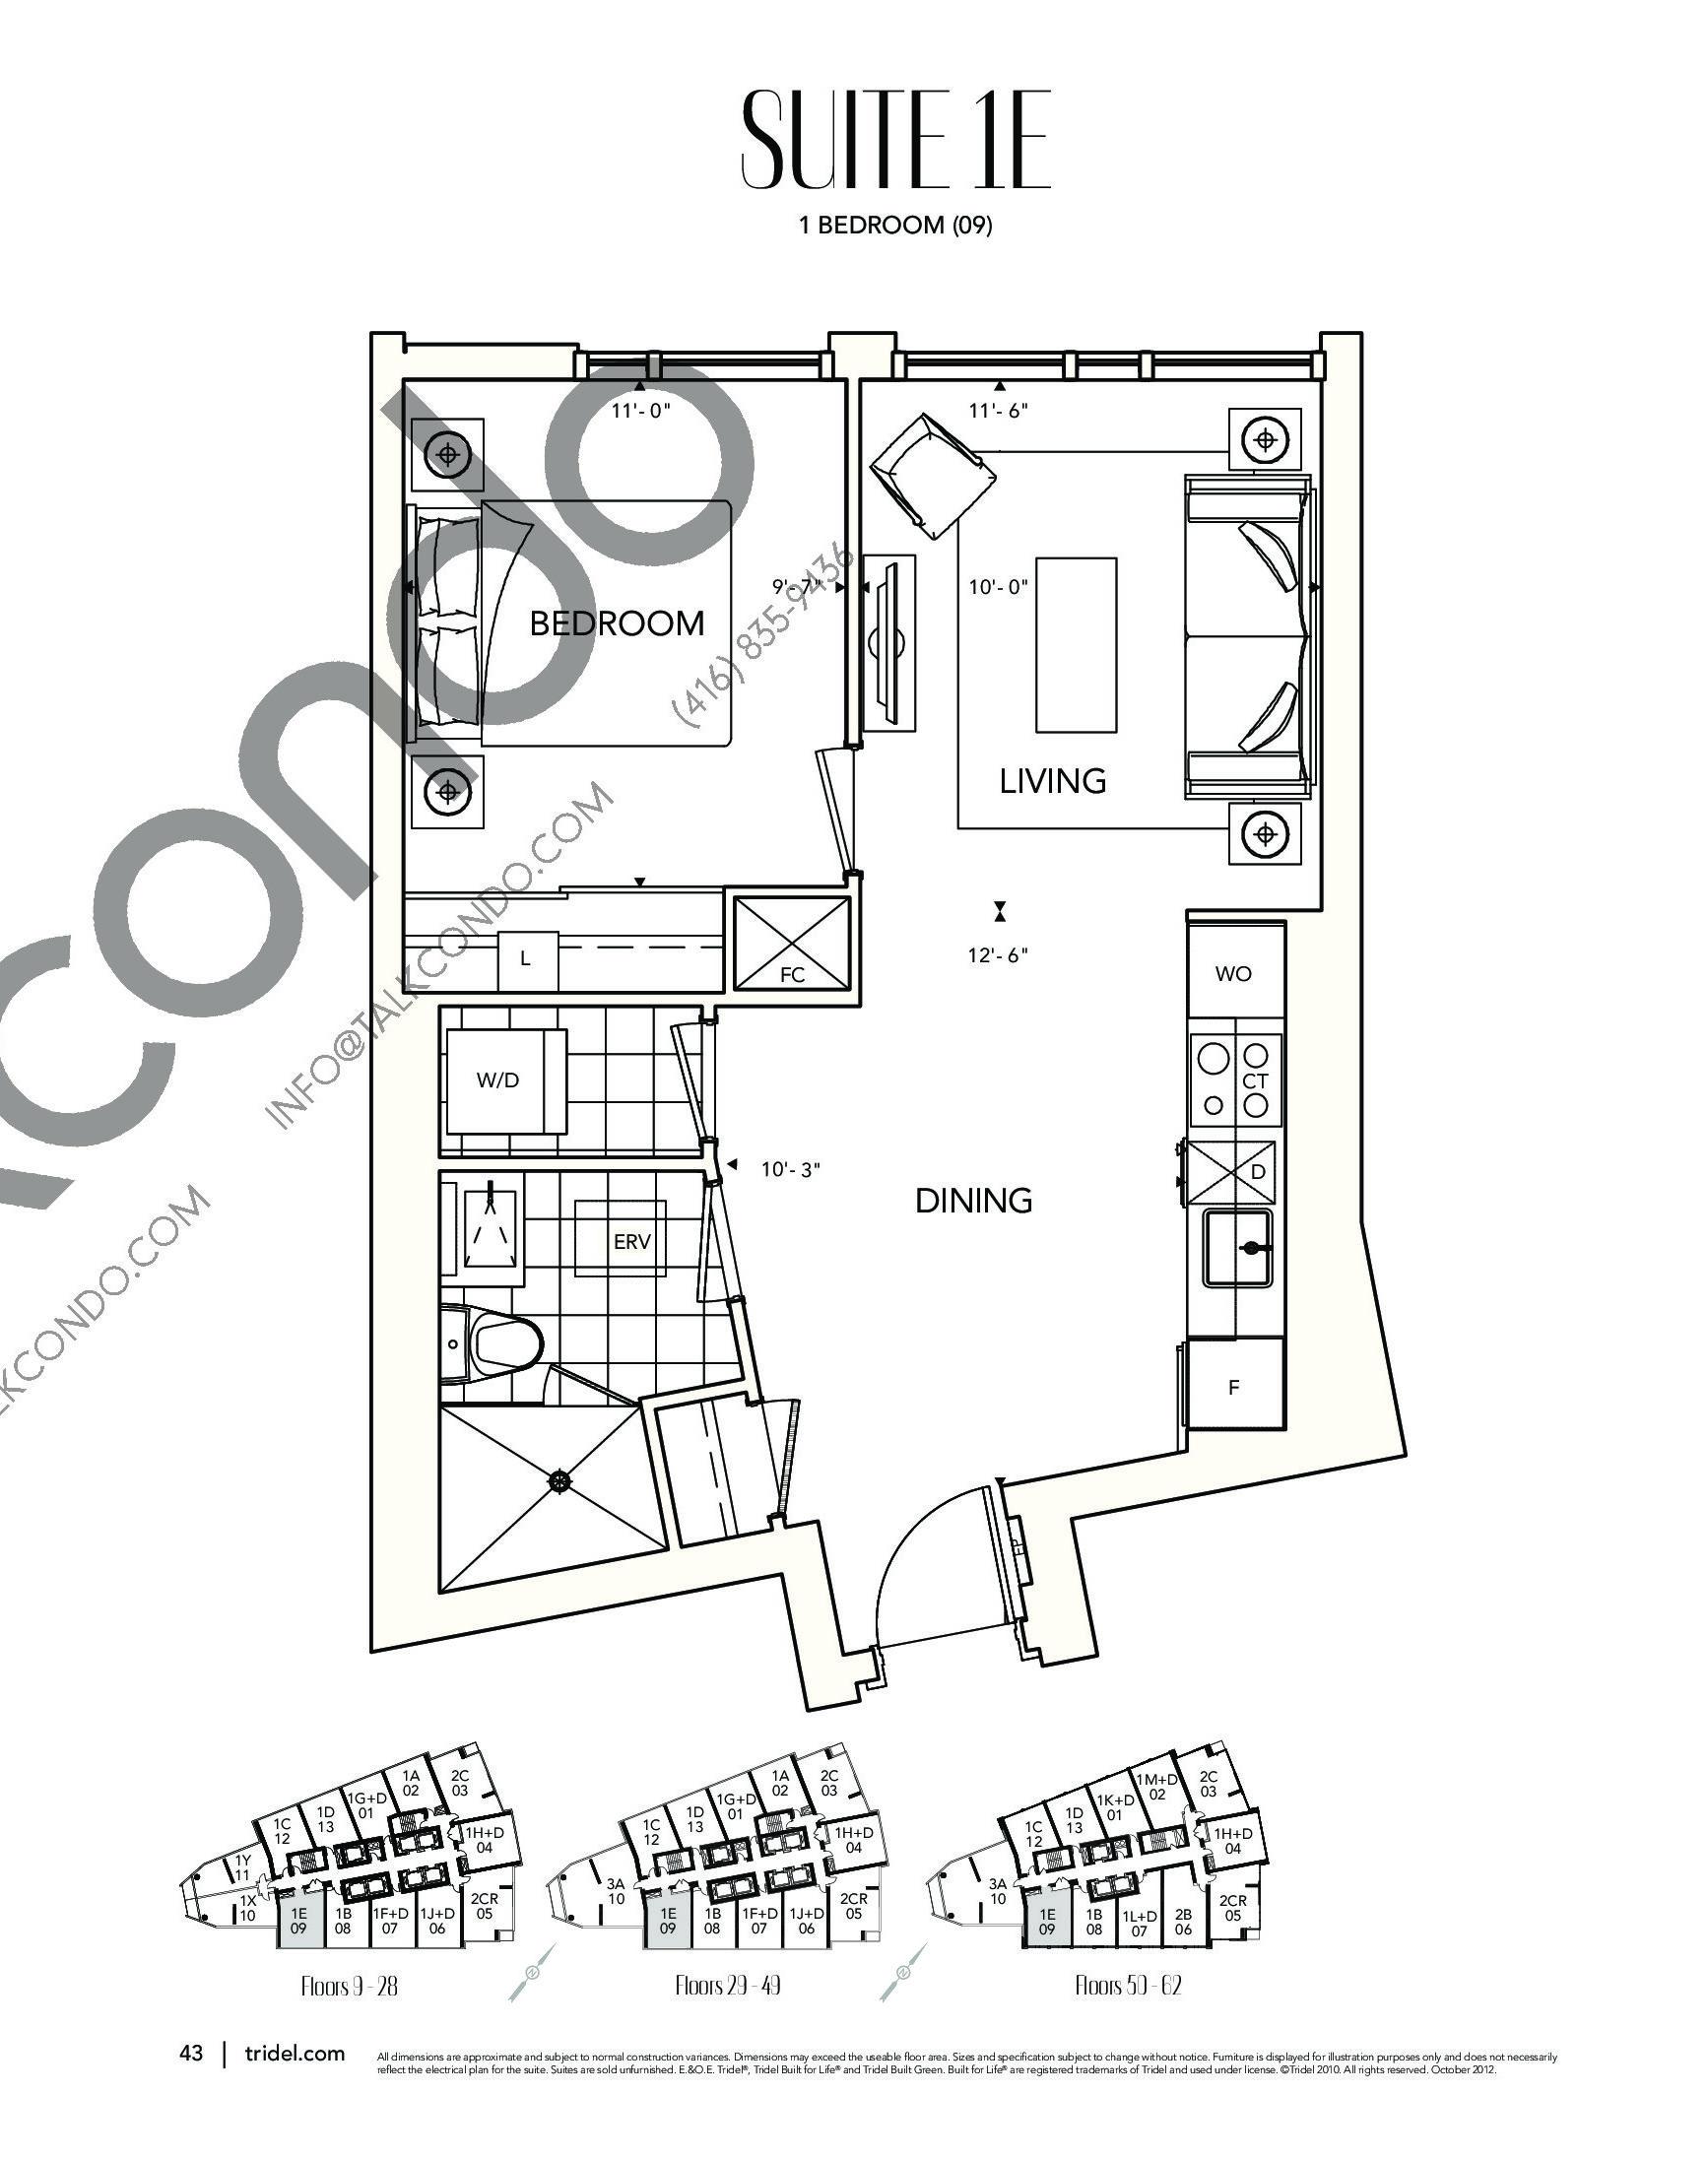 Suite 1E Floor Plan at Ten York Condos - 602 sq.ft